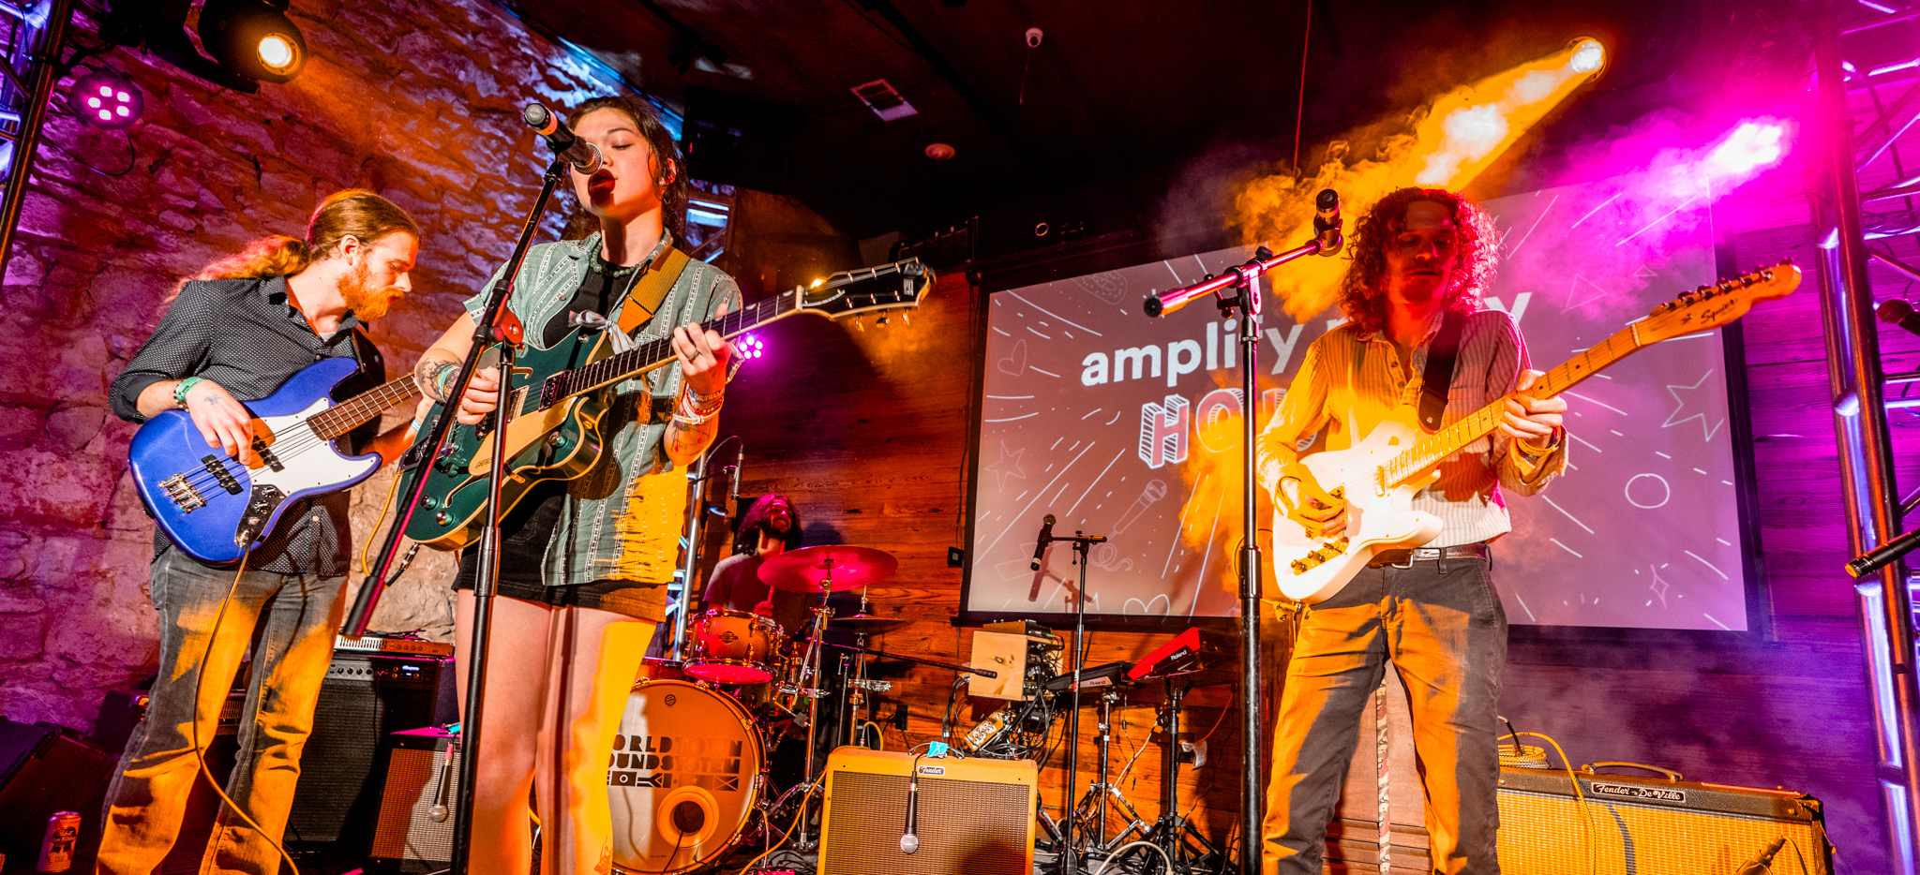 Amplify Philly Case Study – REC25